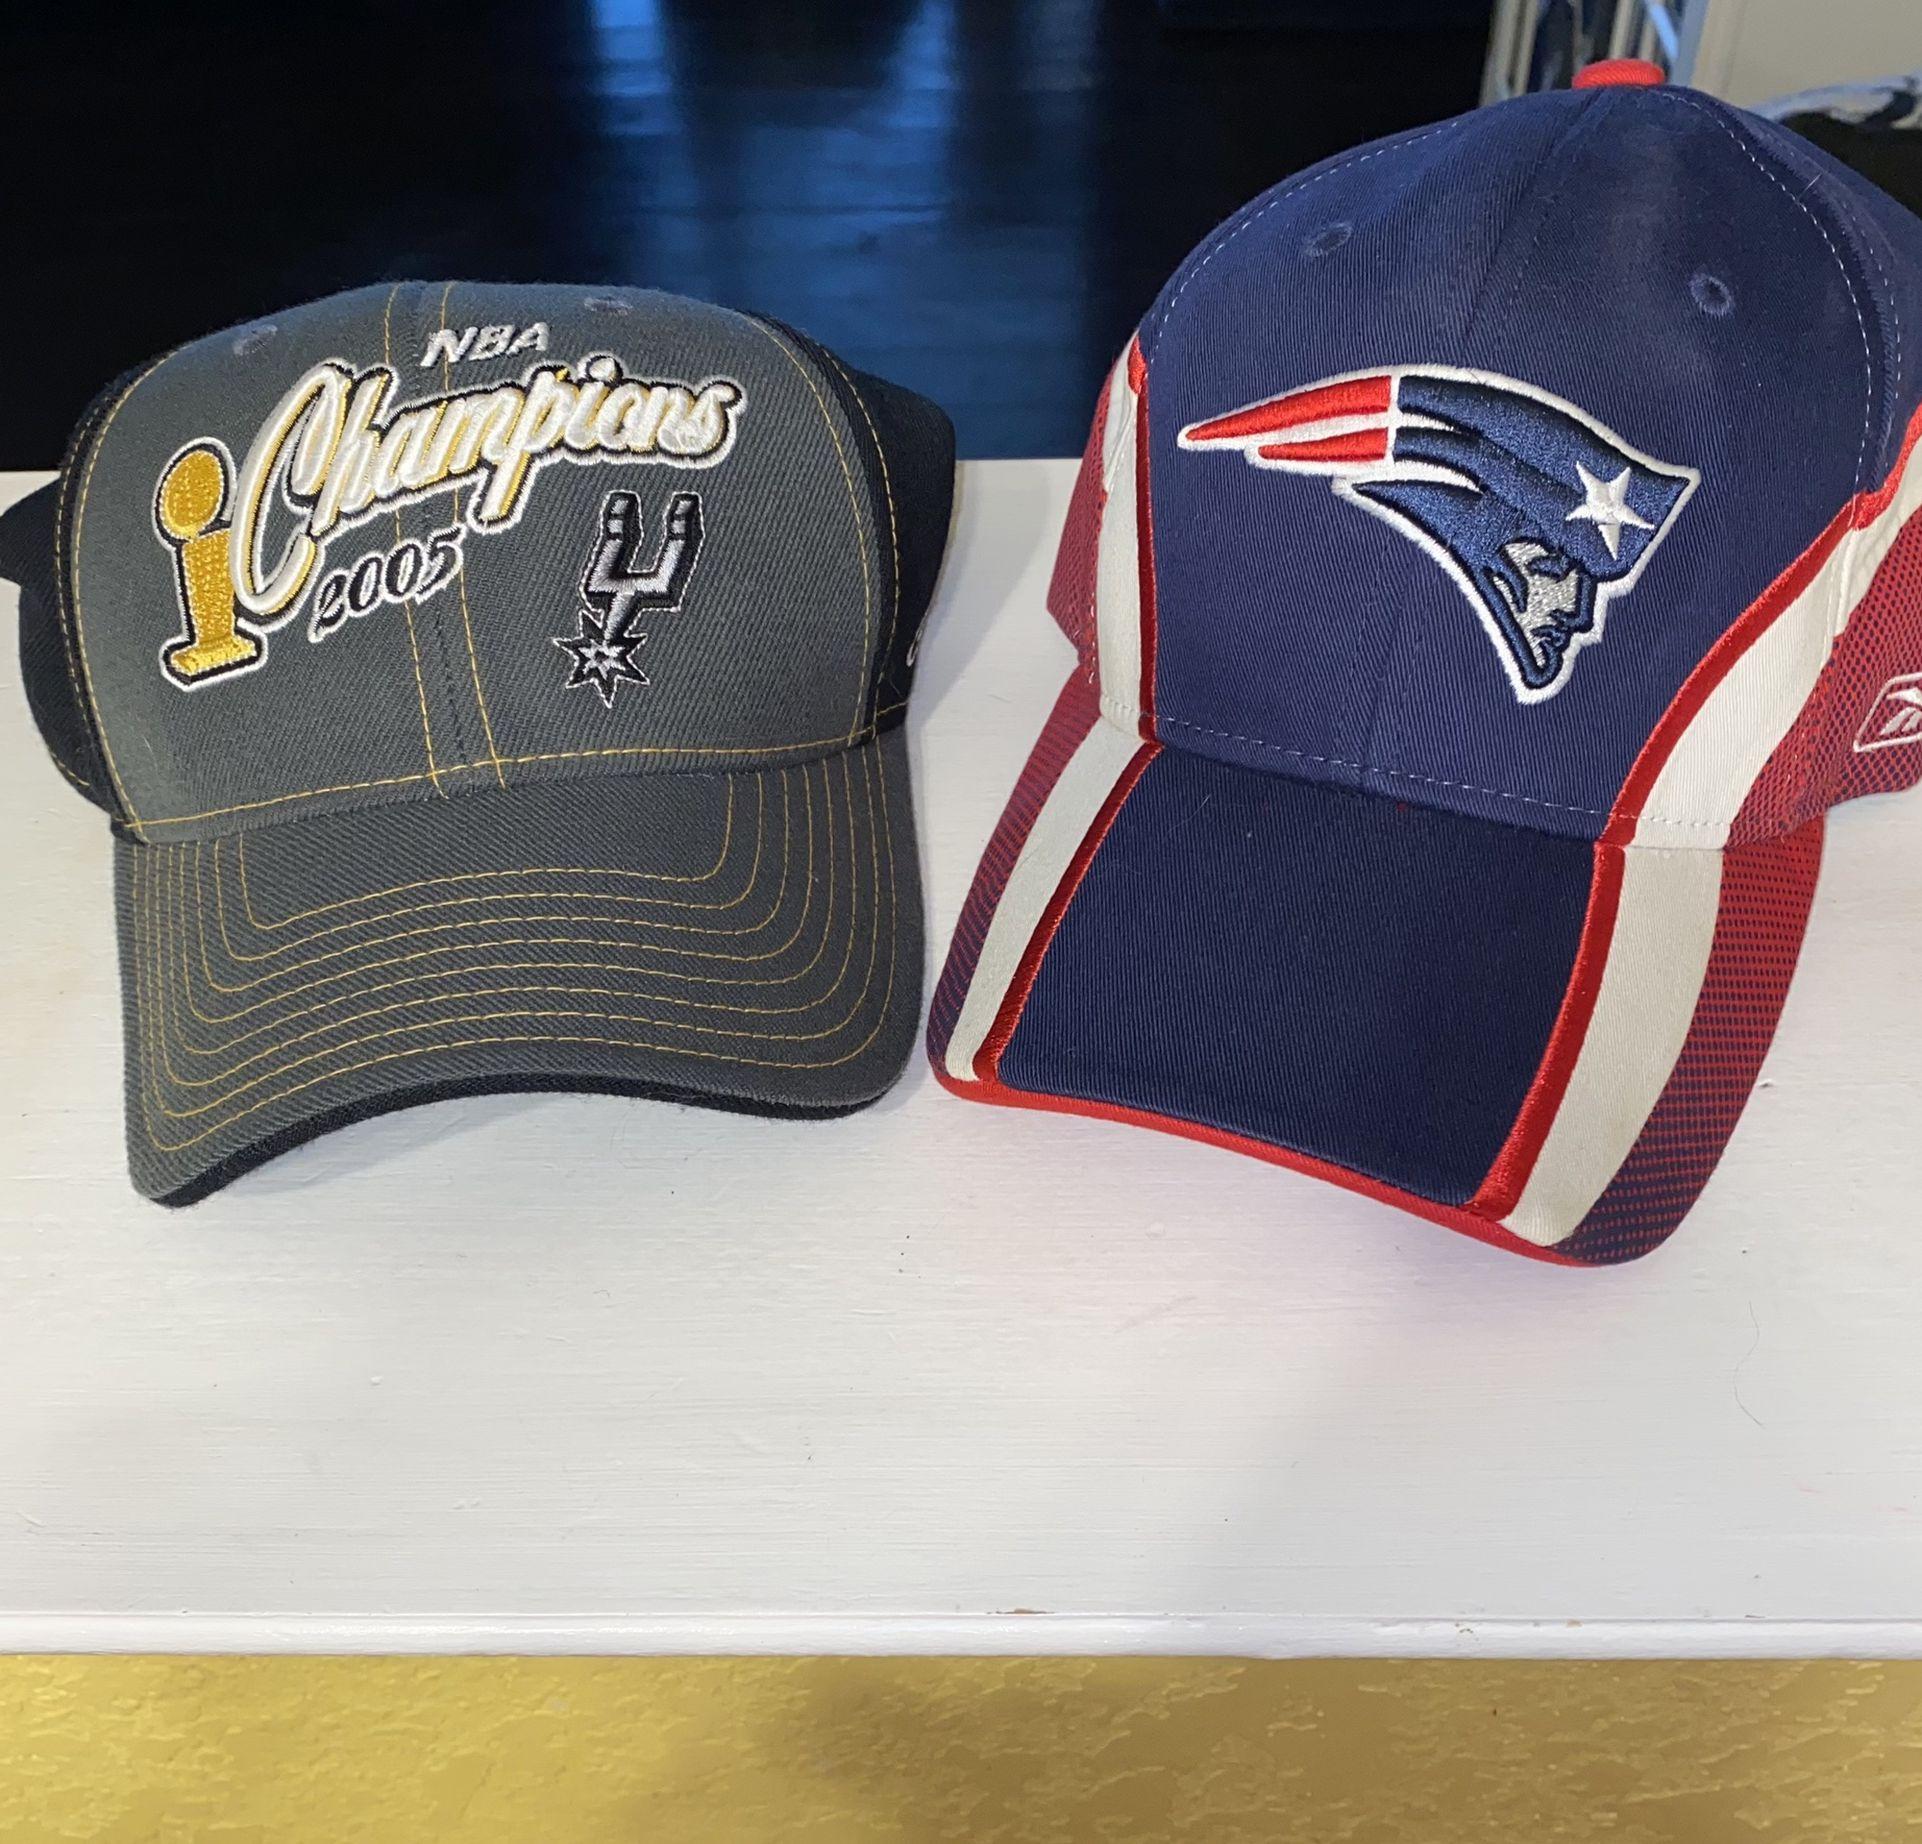 $10 Spurs and Patriots caps